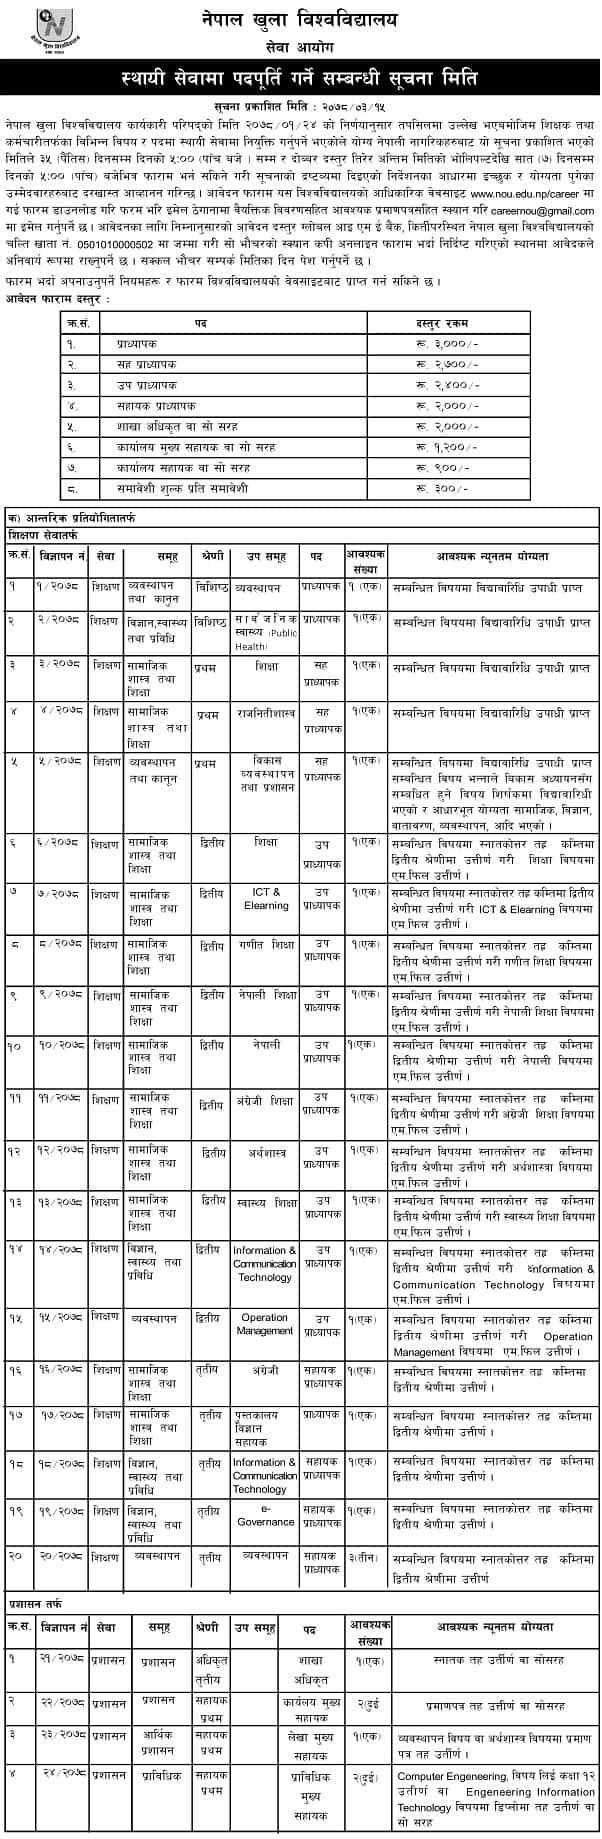 Nepal open university vacancy 2078